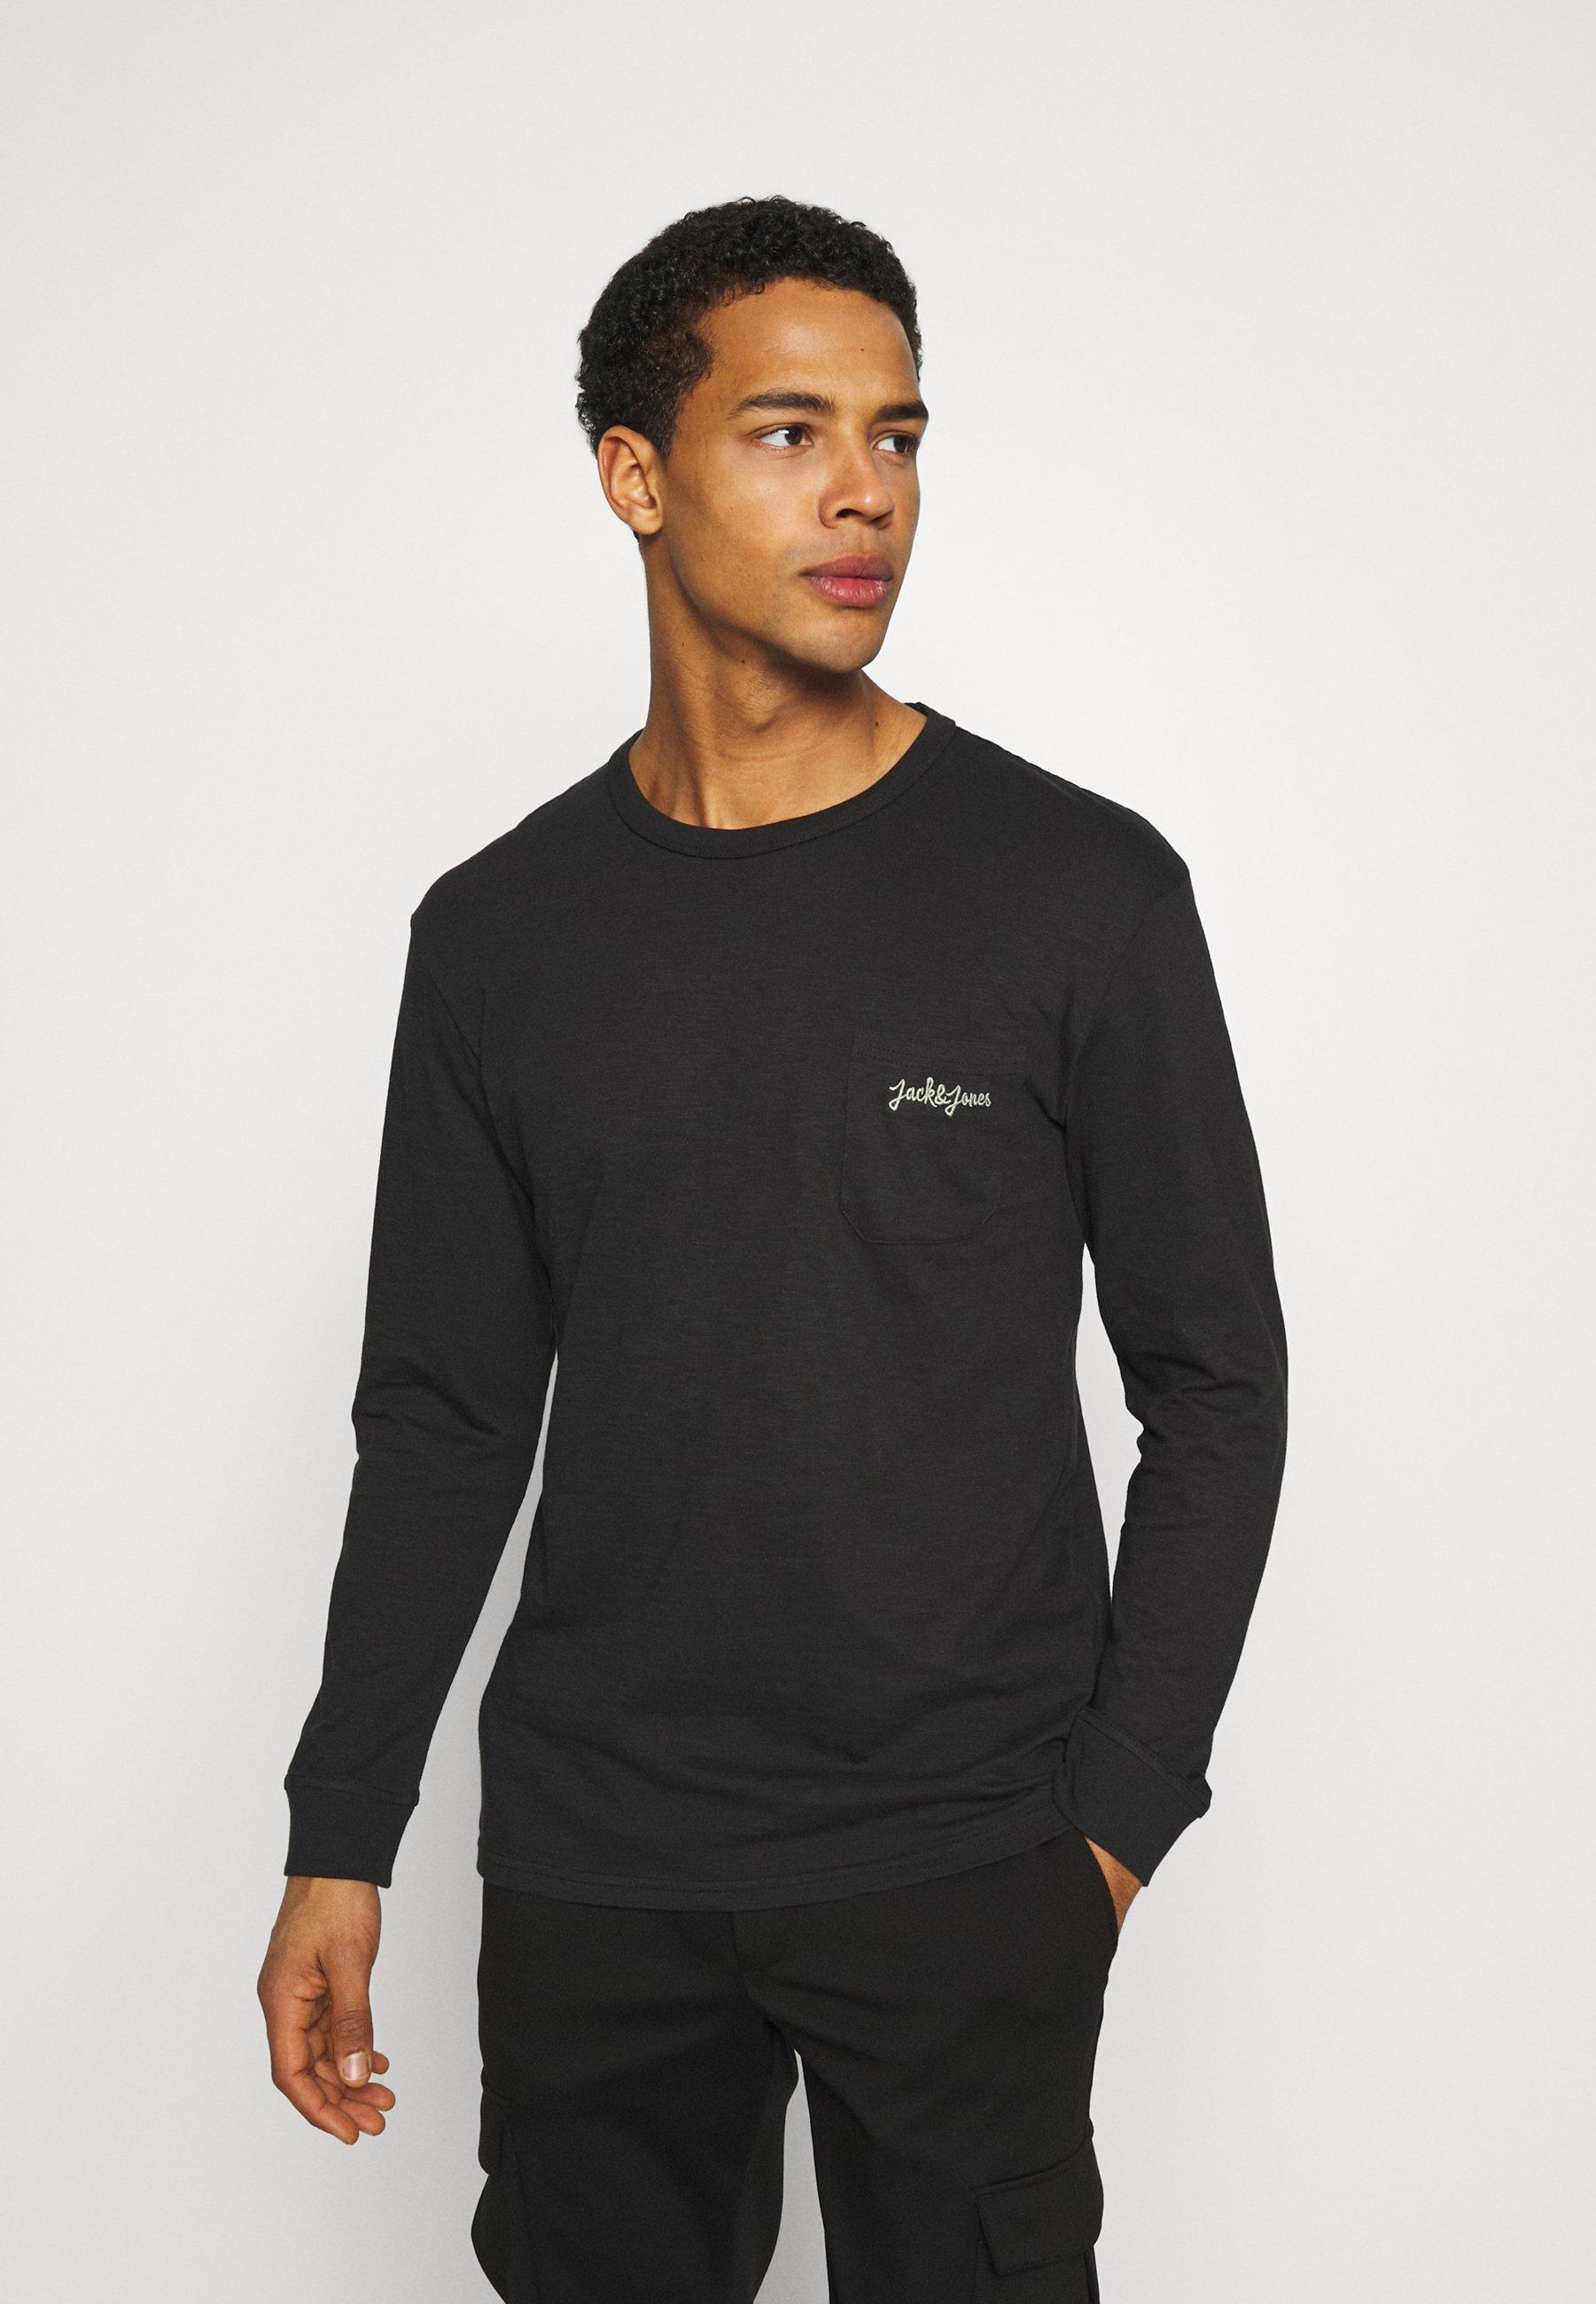 Men JORSTOCKHOLM CREW NECK - Long sleeved top